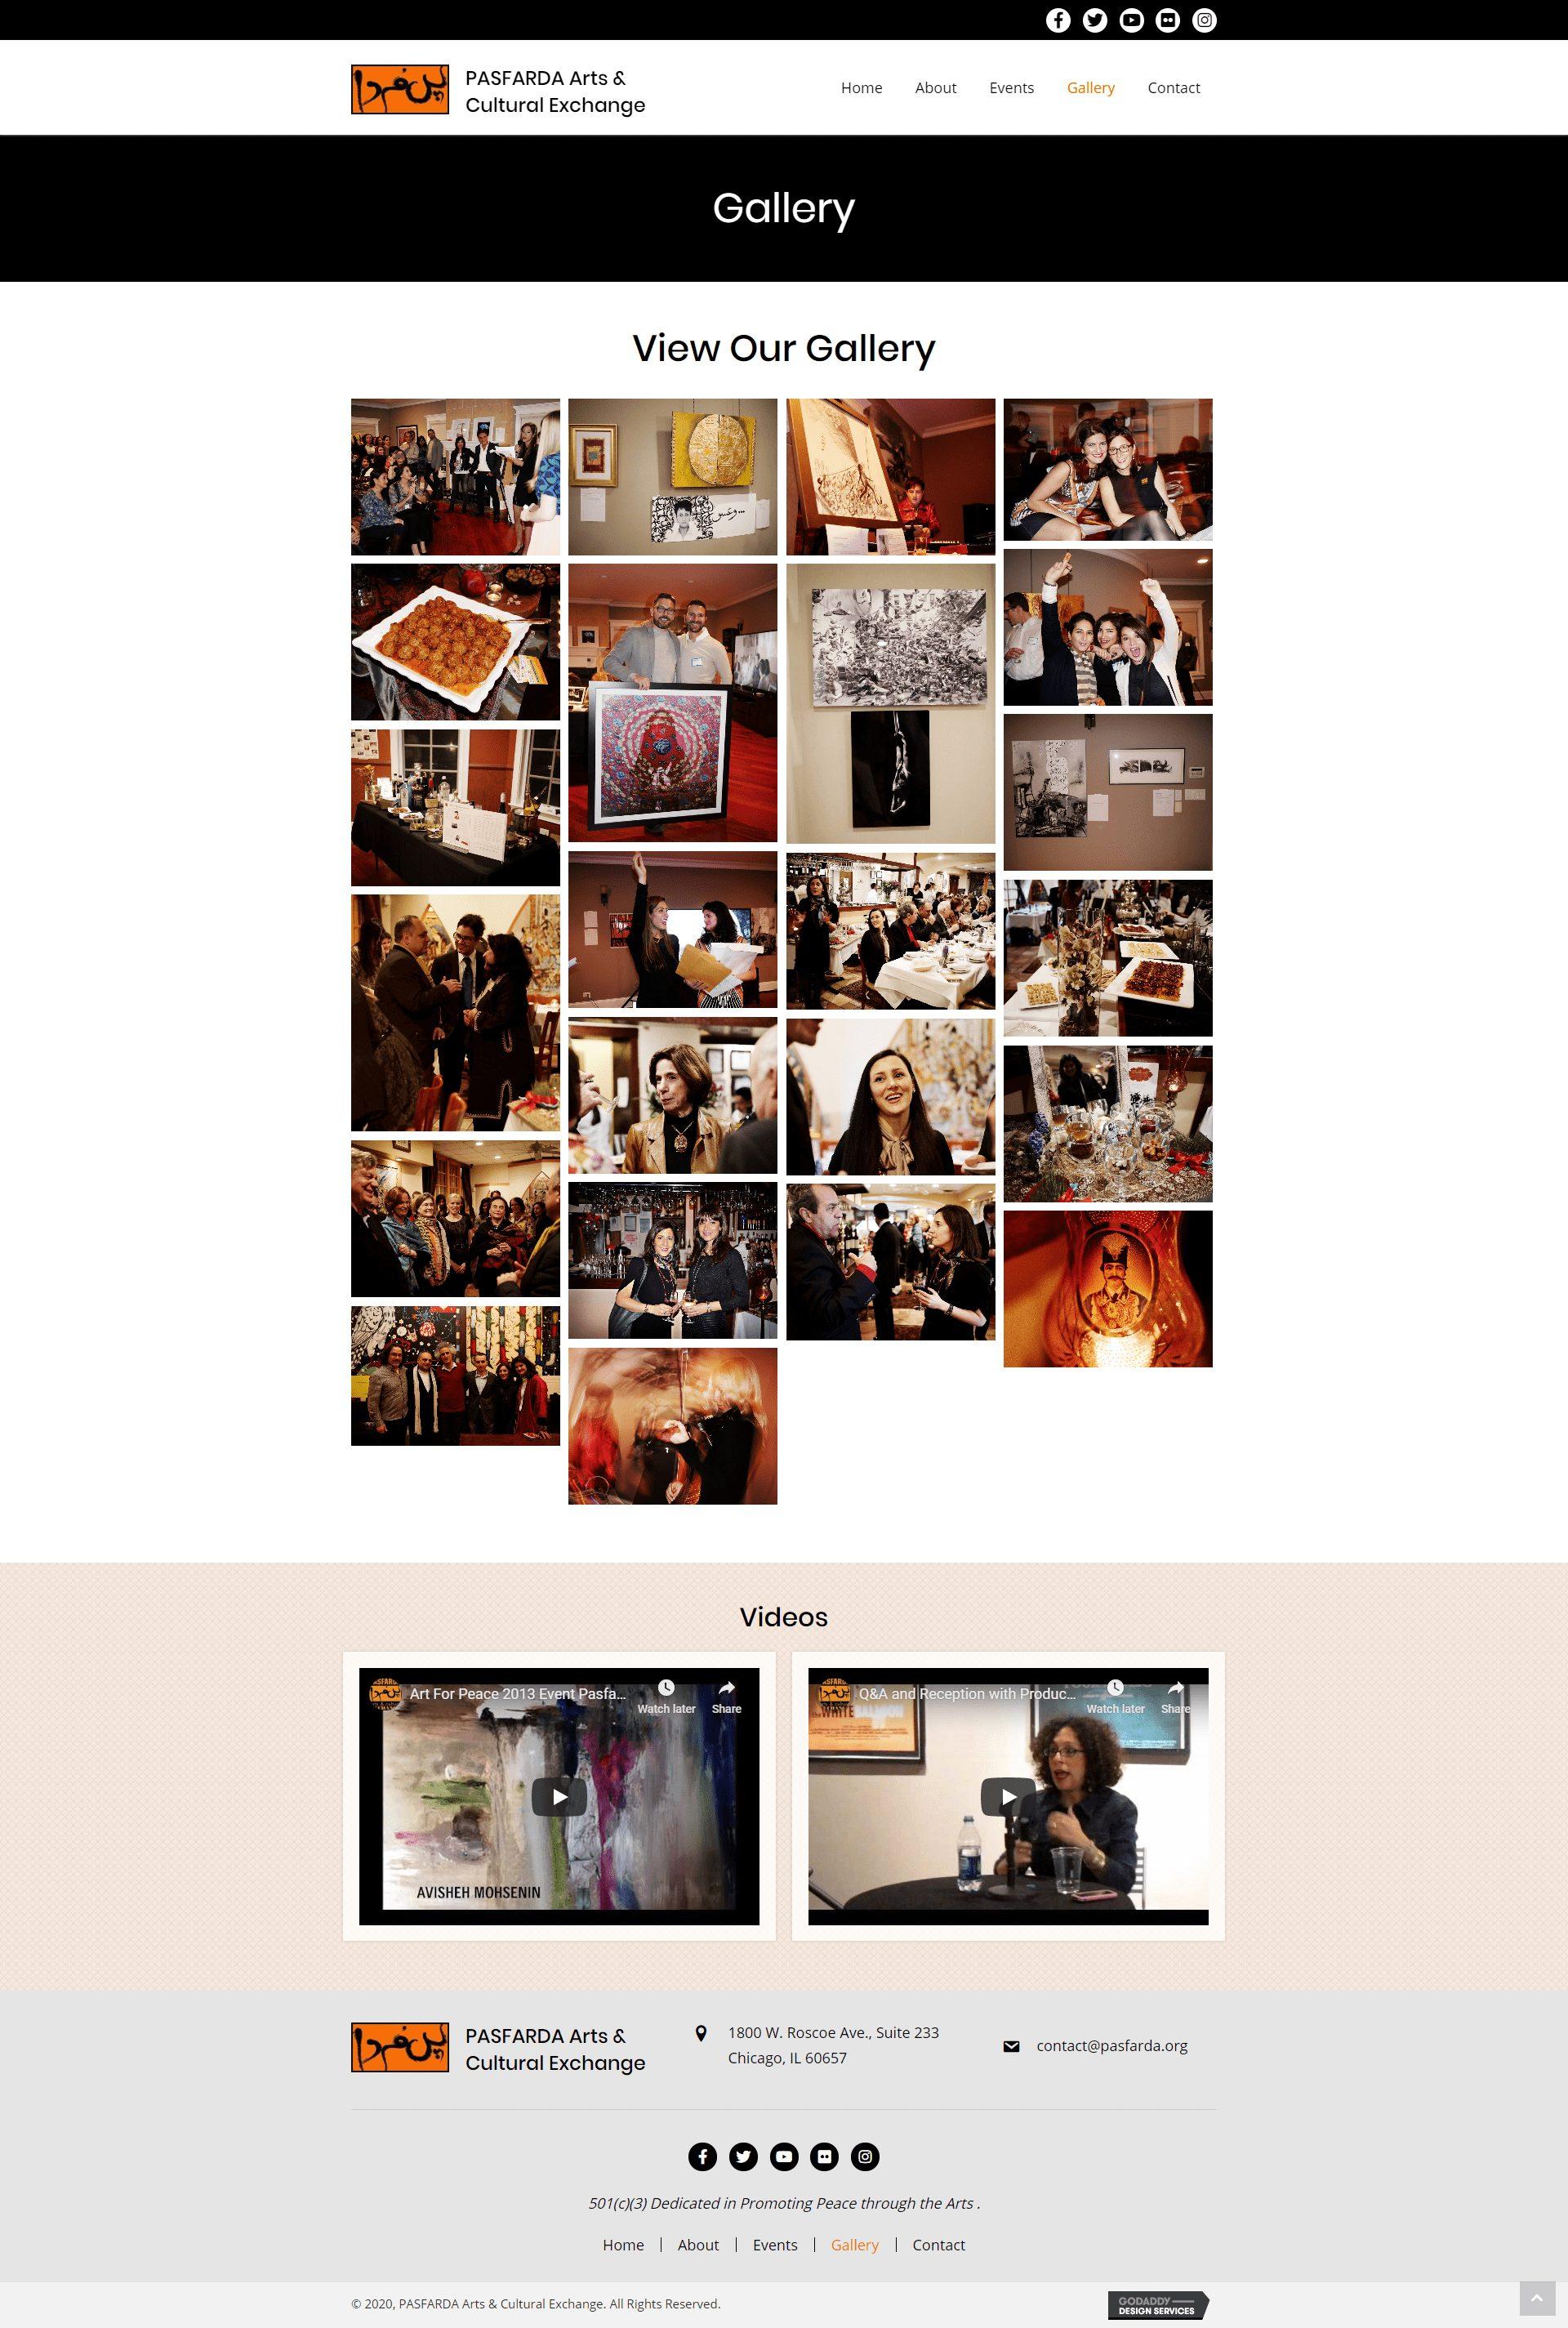 screencapture-m4g-bf8-myftpupload-gallery